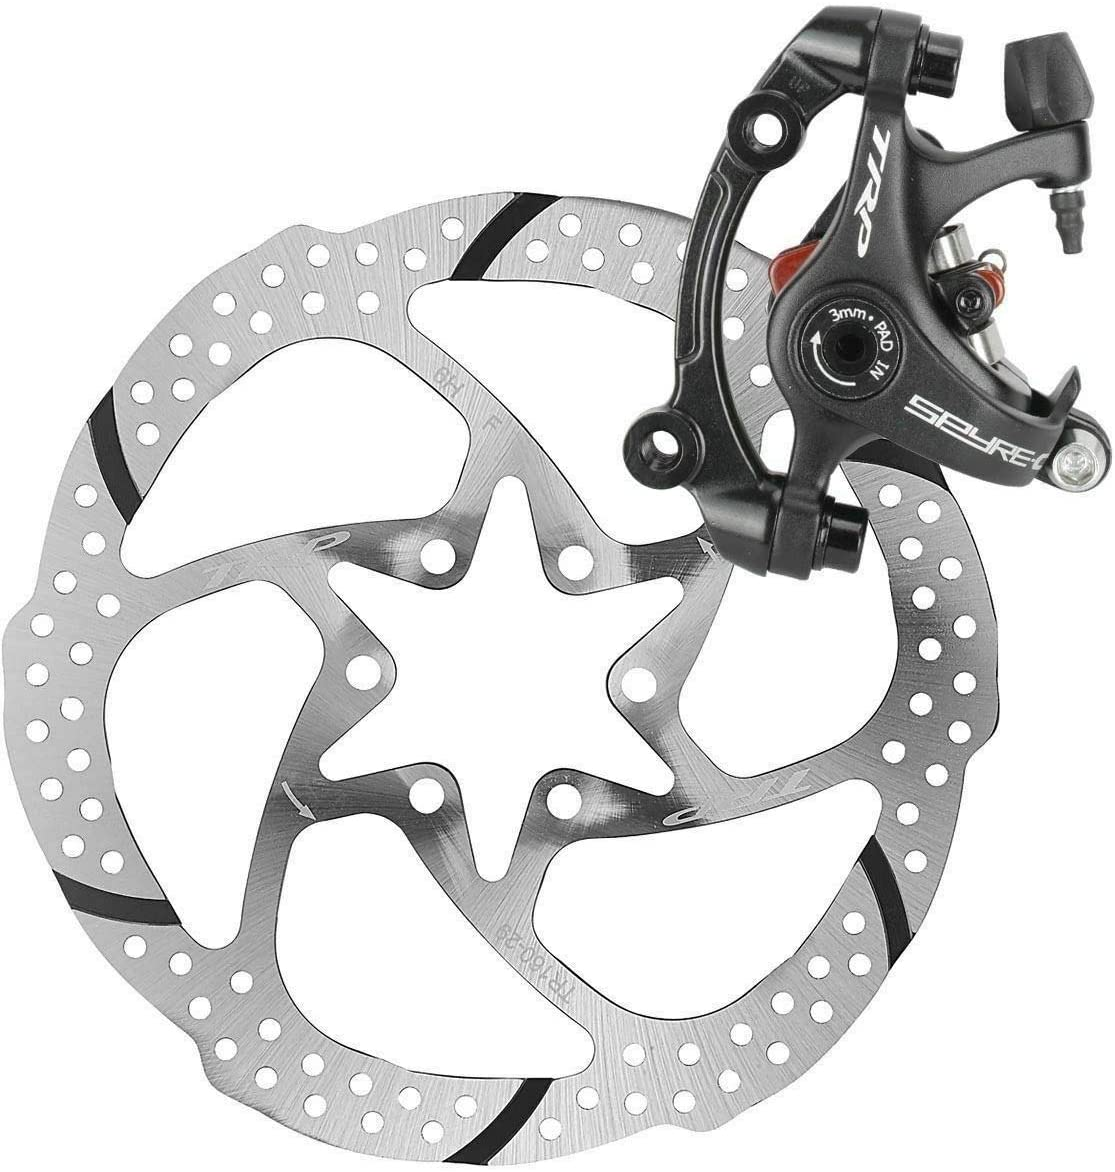 TRP SPYRE Road Bike Mechancial Disc Brake Caliper Post Mount 160 Rotor F or R